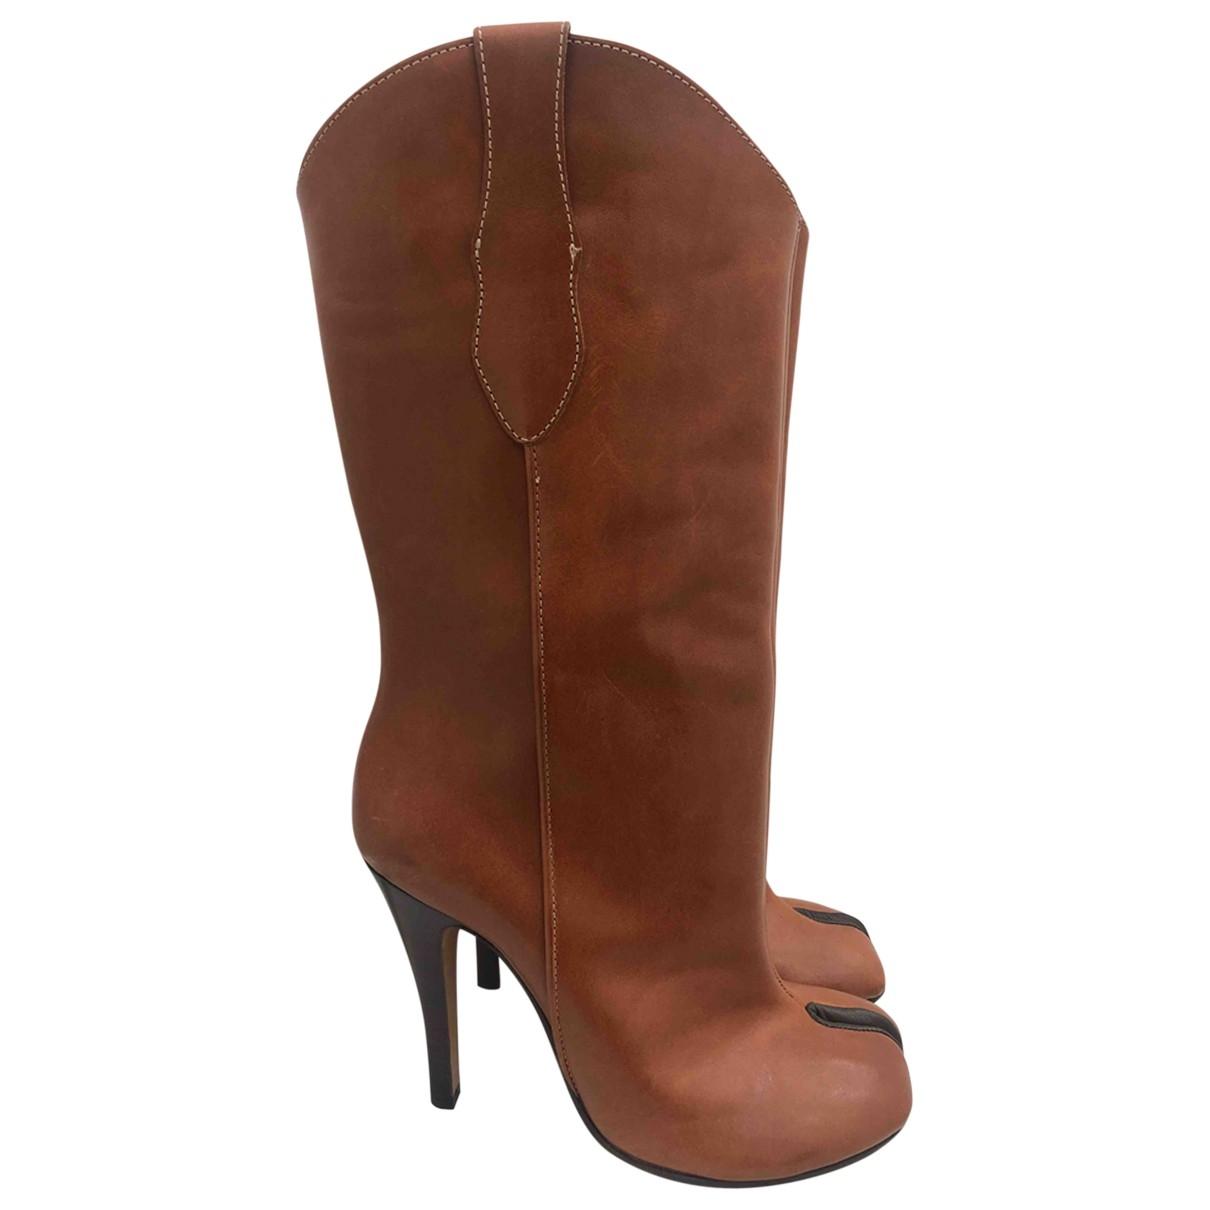 Maison Martin Margiela Tabi Brown Leather Boots for Women 40 EU